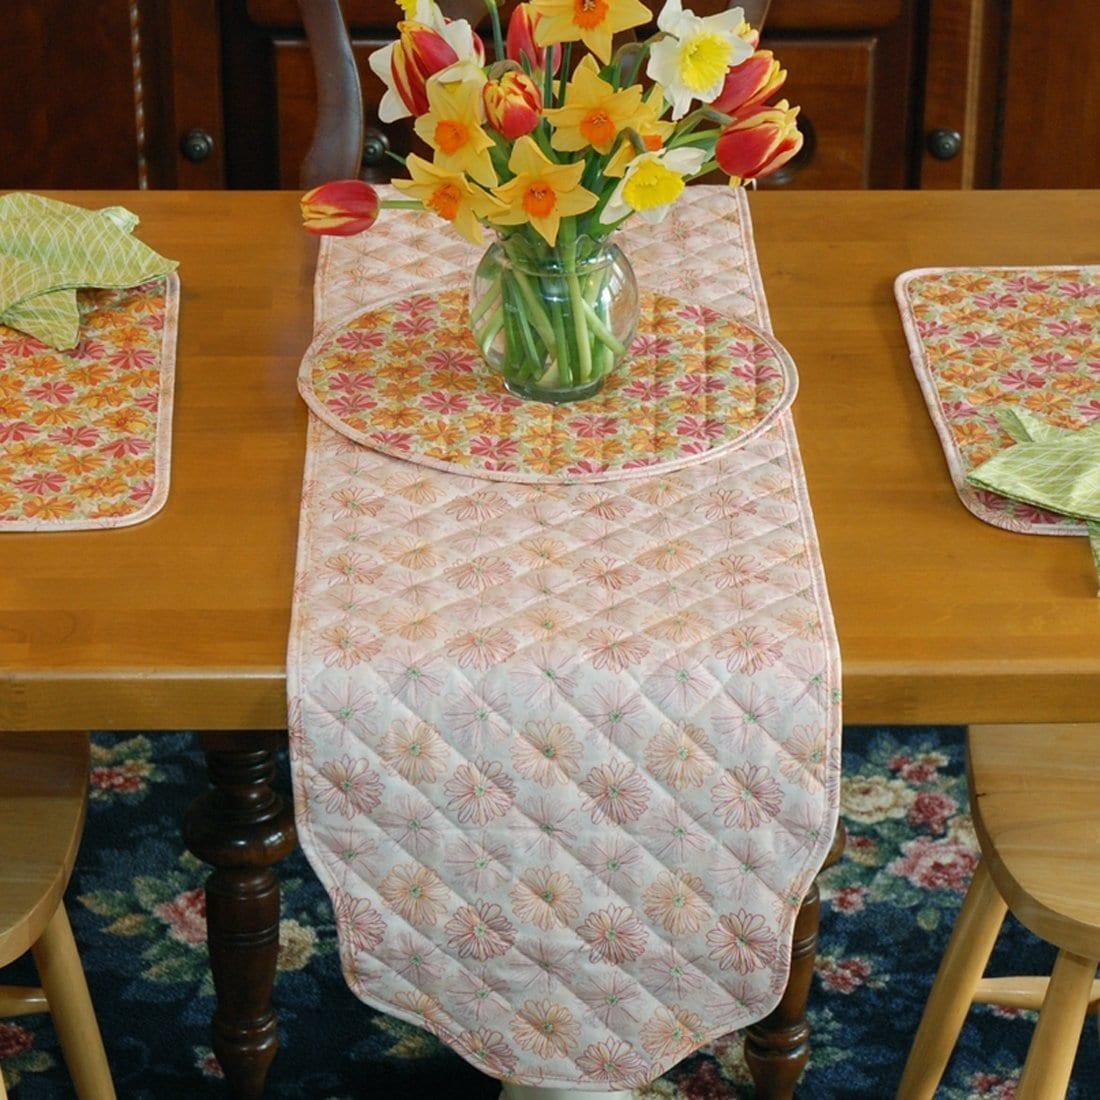 Sweet Pea Linens - Pink & Orange Floral Print 54 inch Table Runner (SKU#: R-1020-M7) - Table Setting